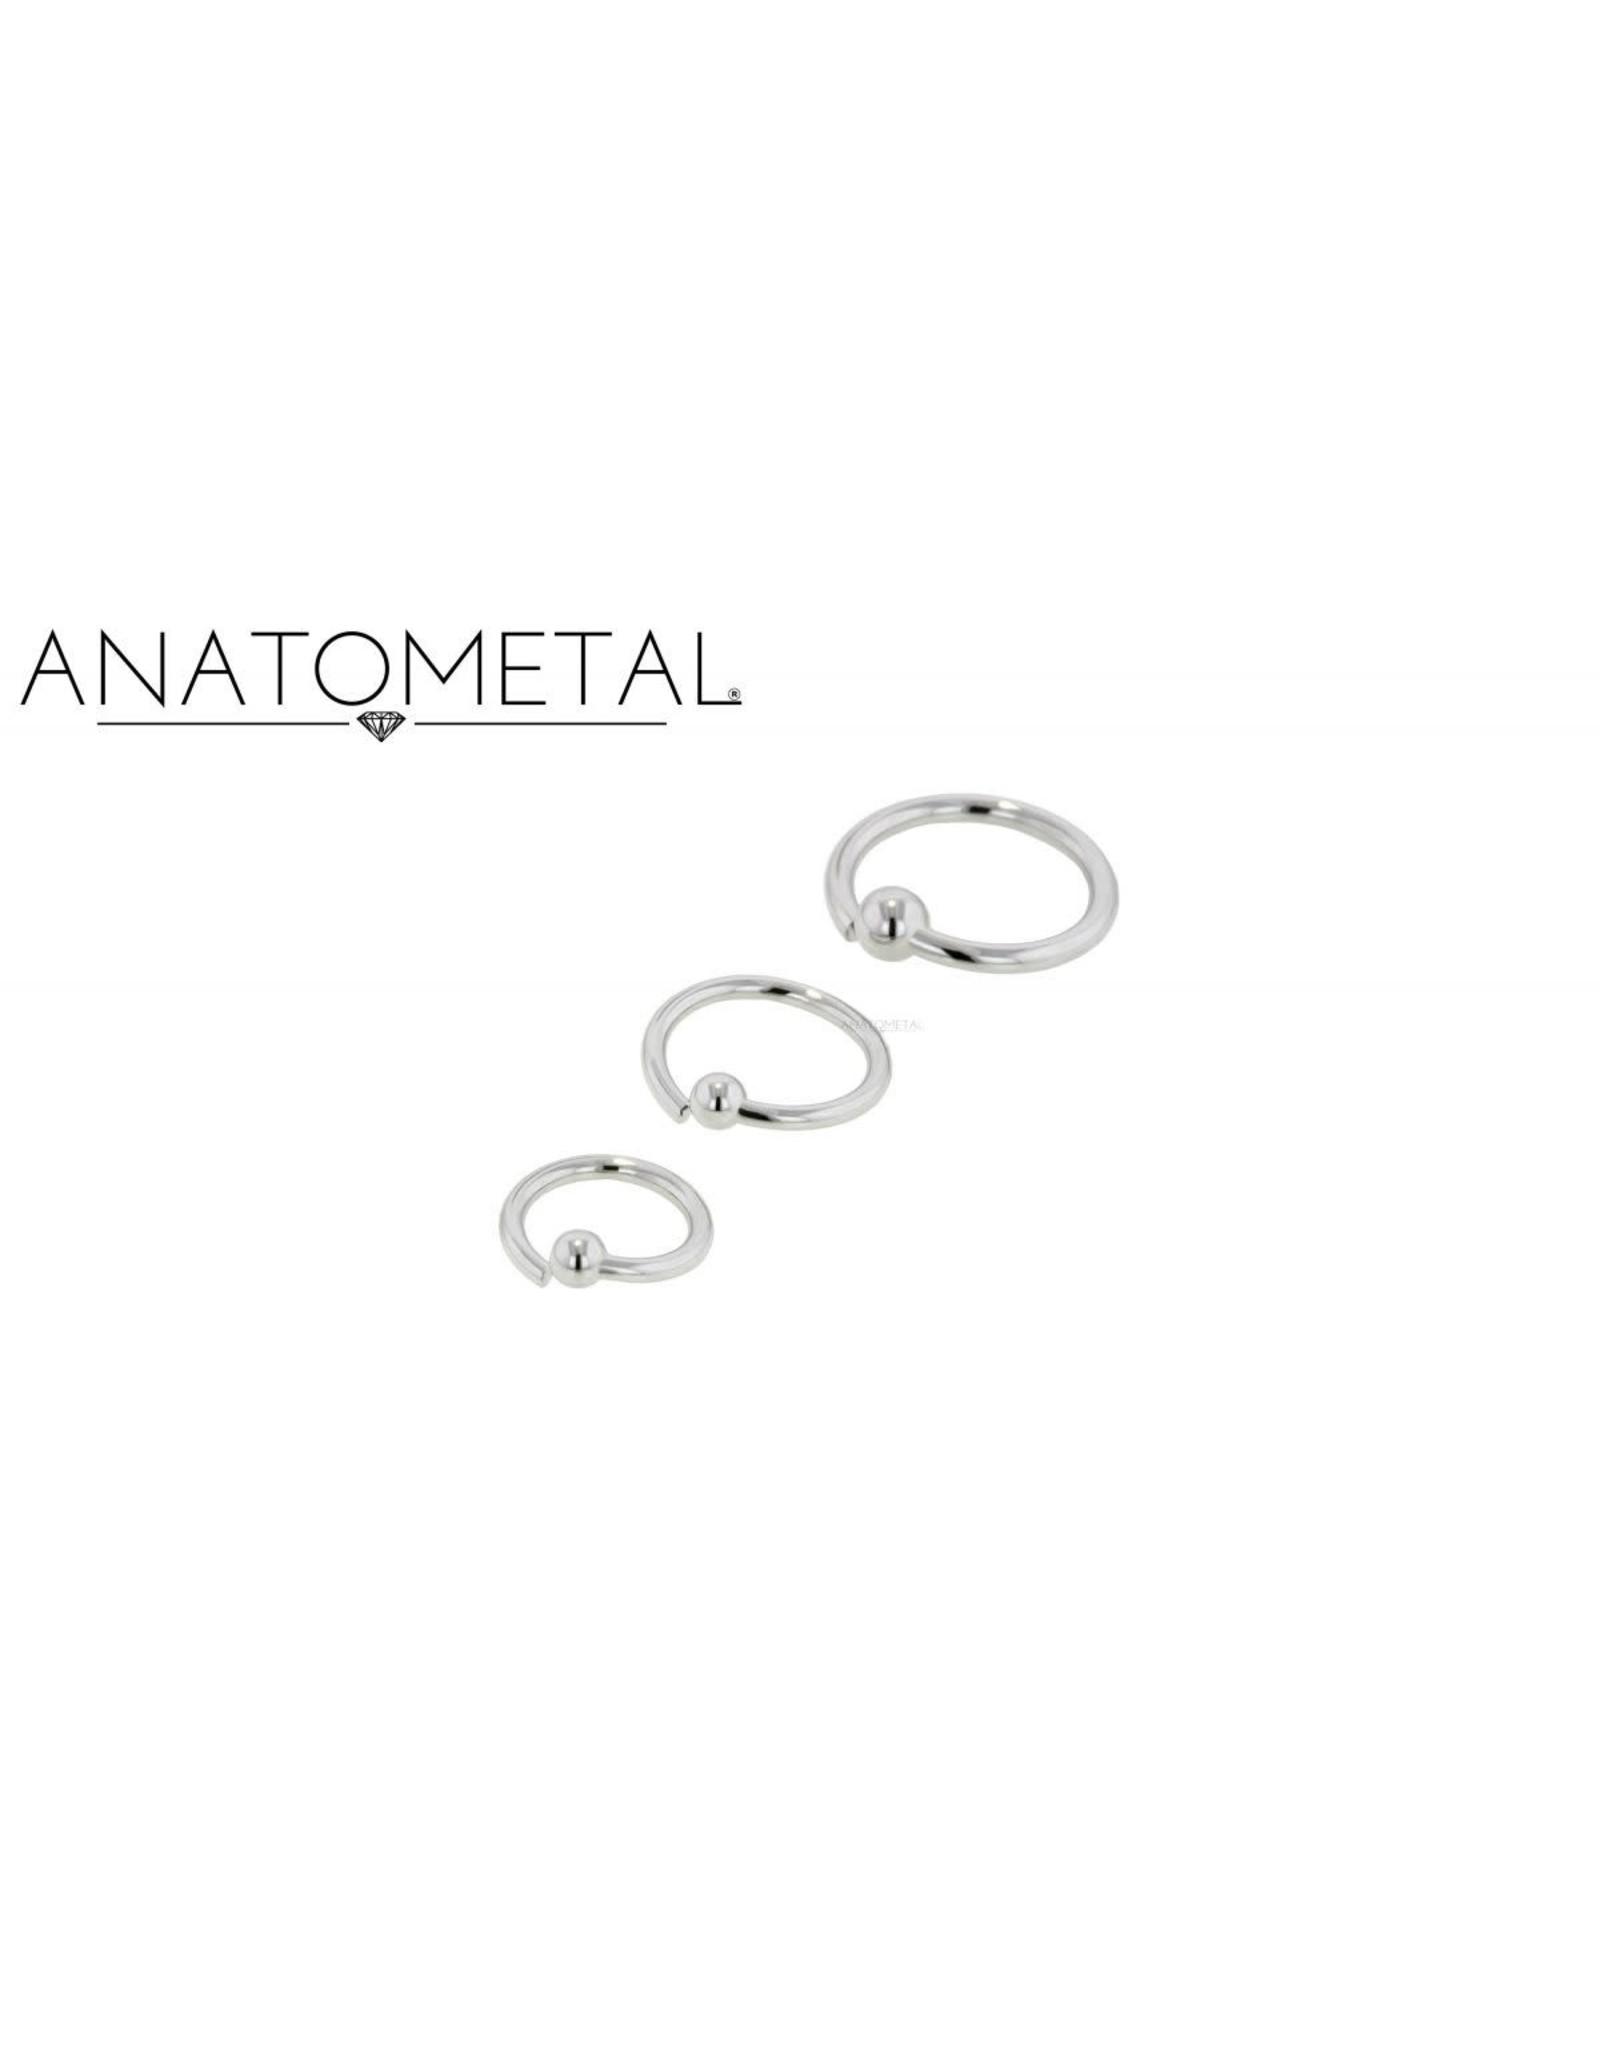 Anatometal Anatometal 20g steel fixed bead ring